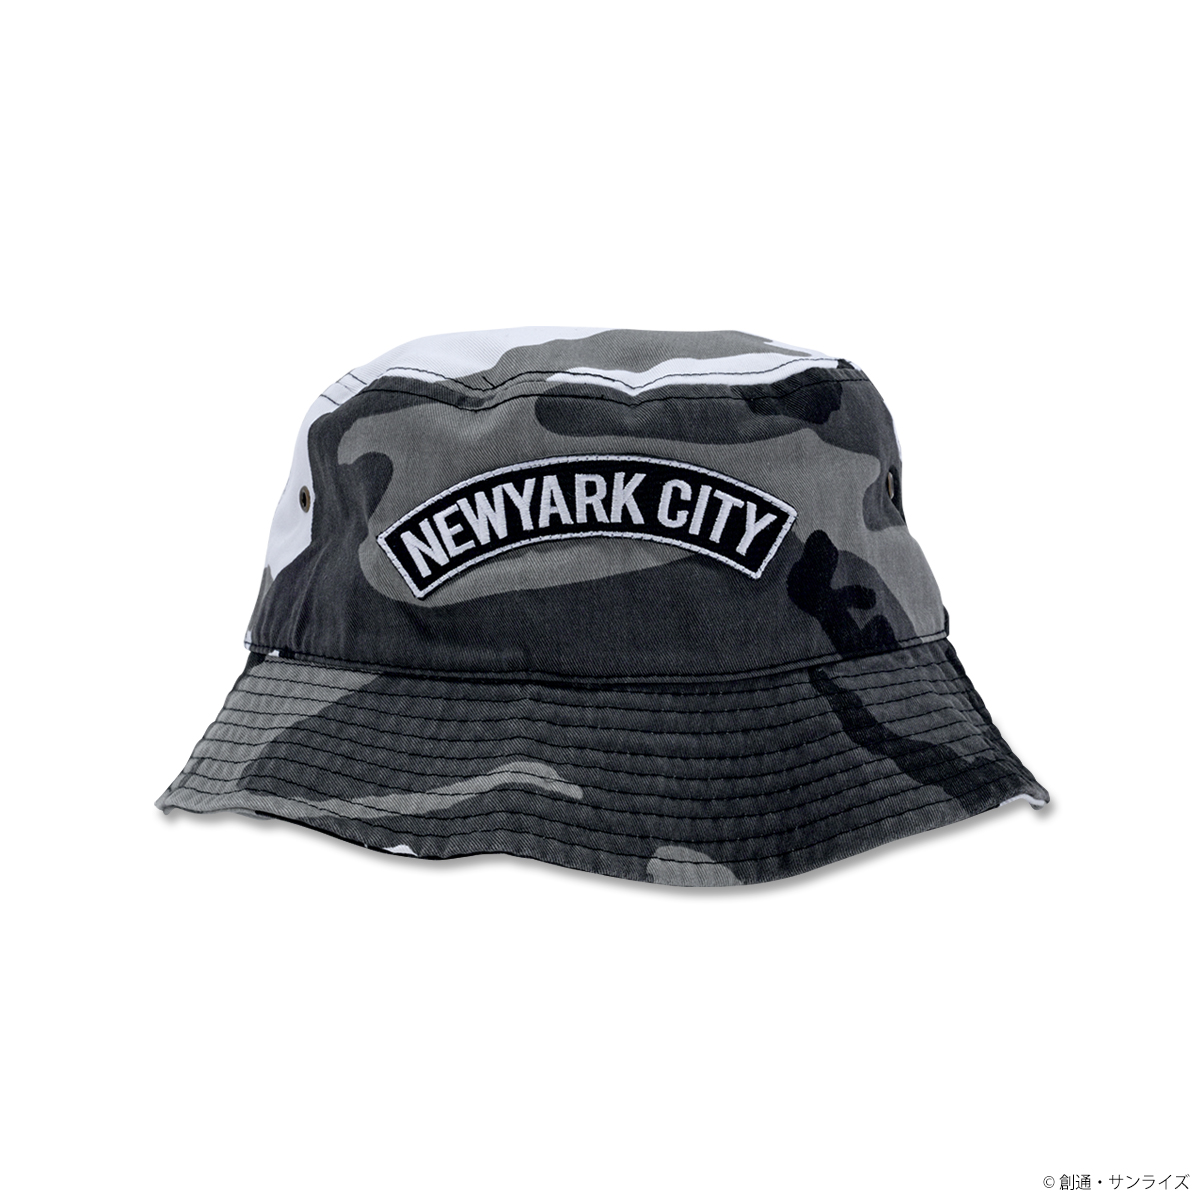 STRICT-G NEW YARK バケットハット